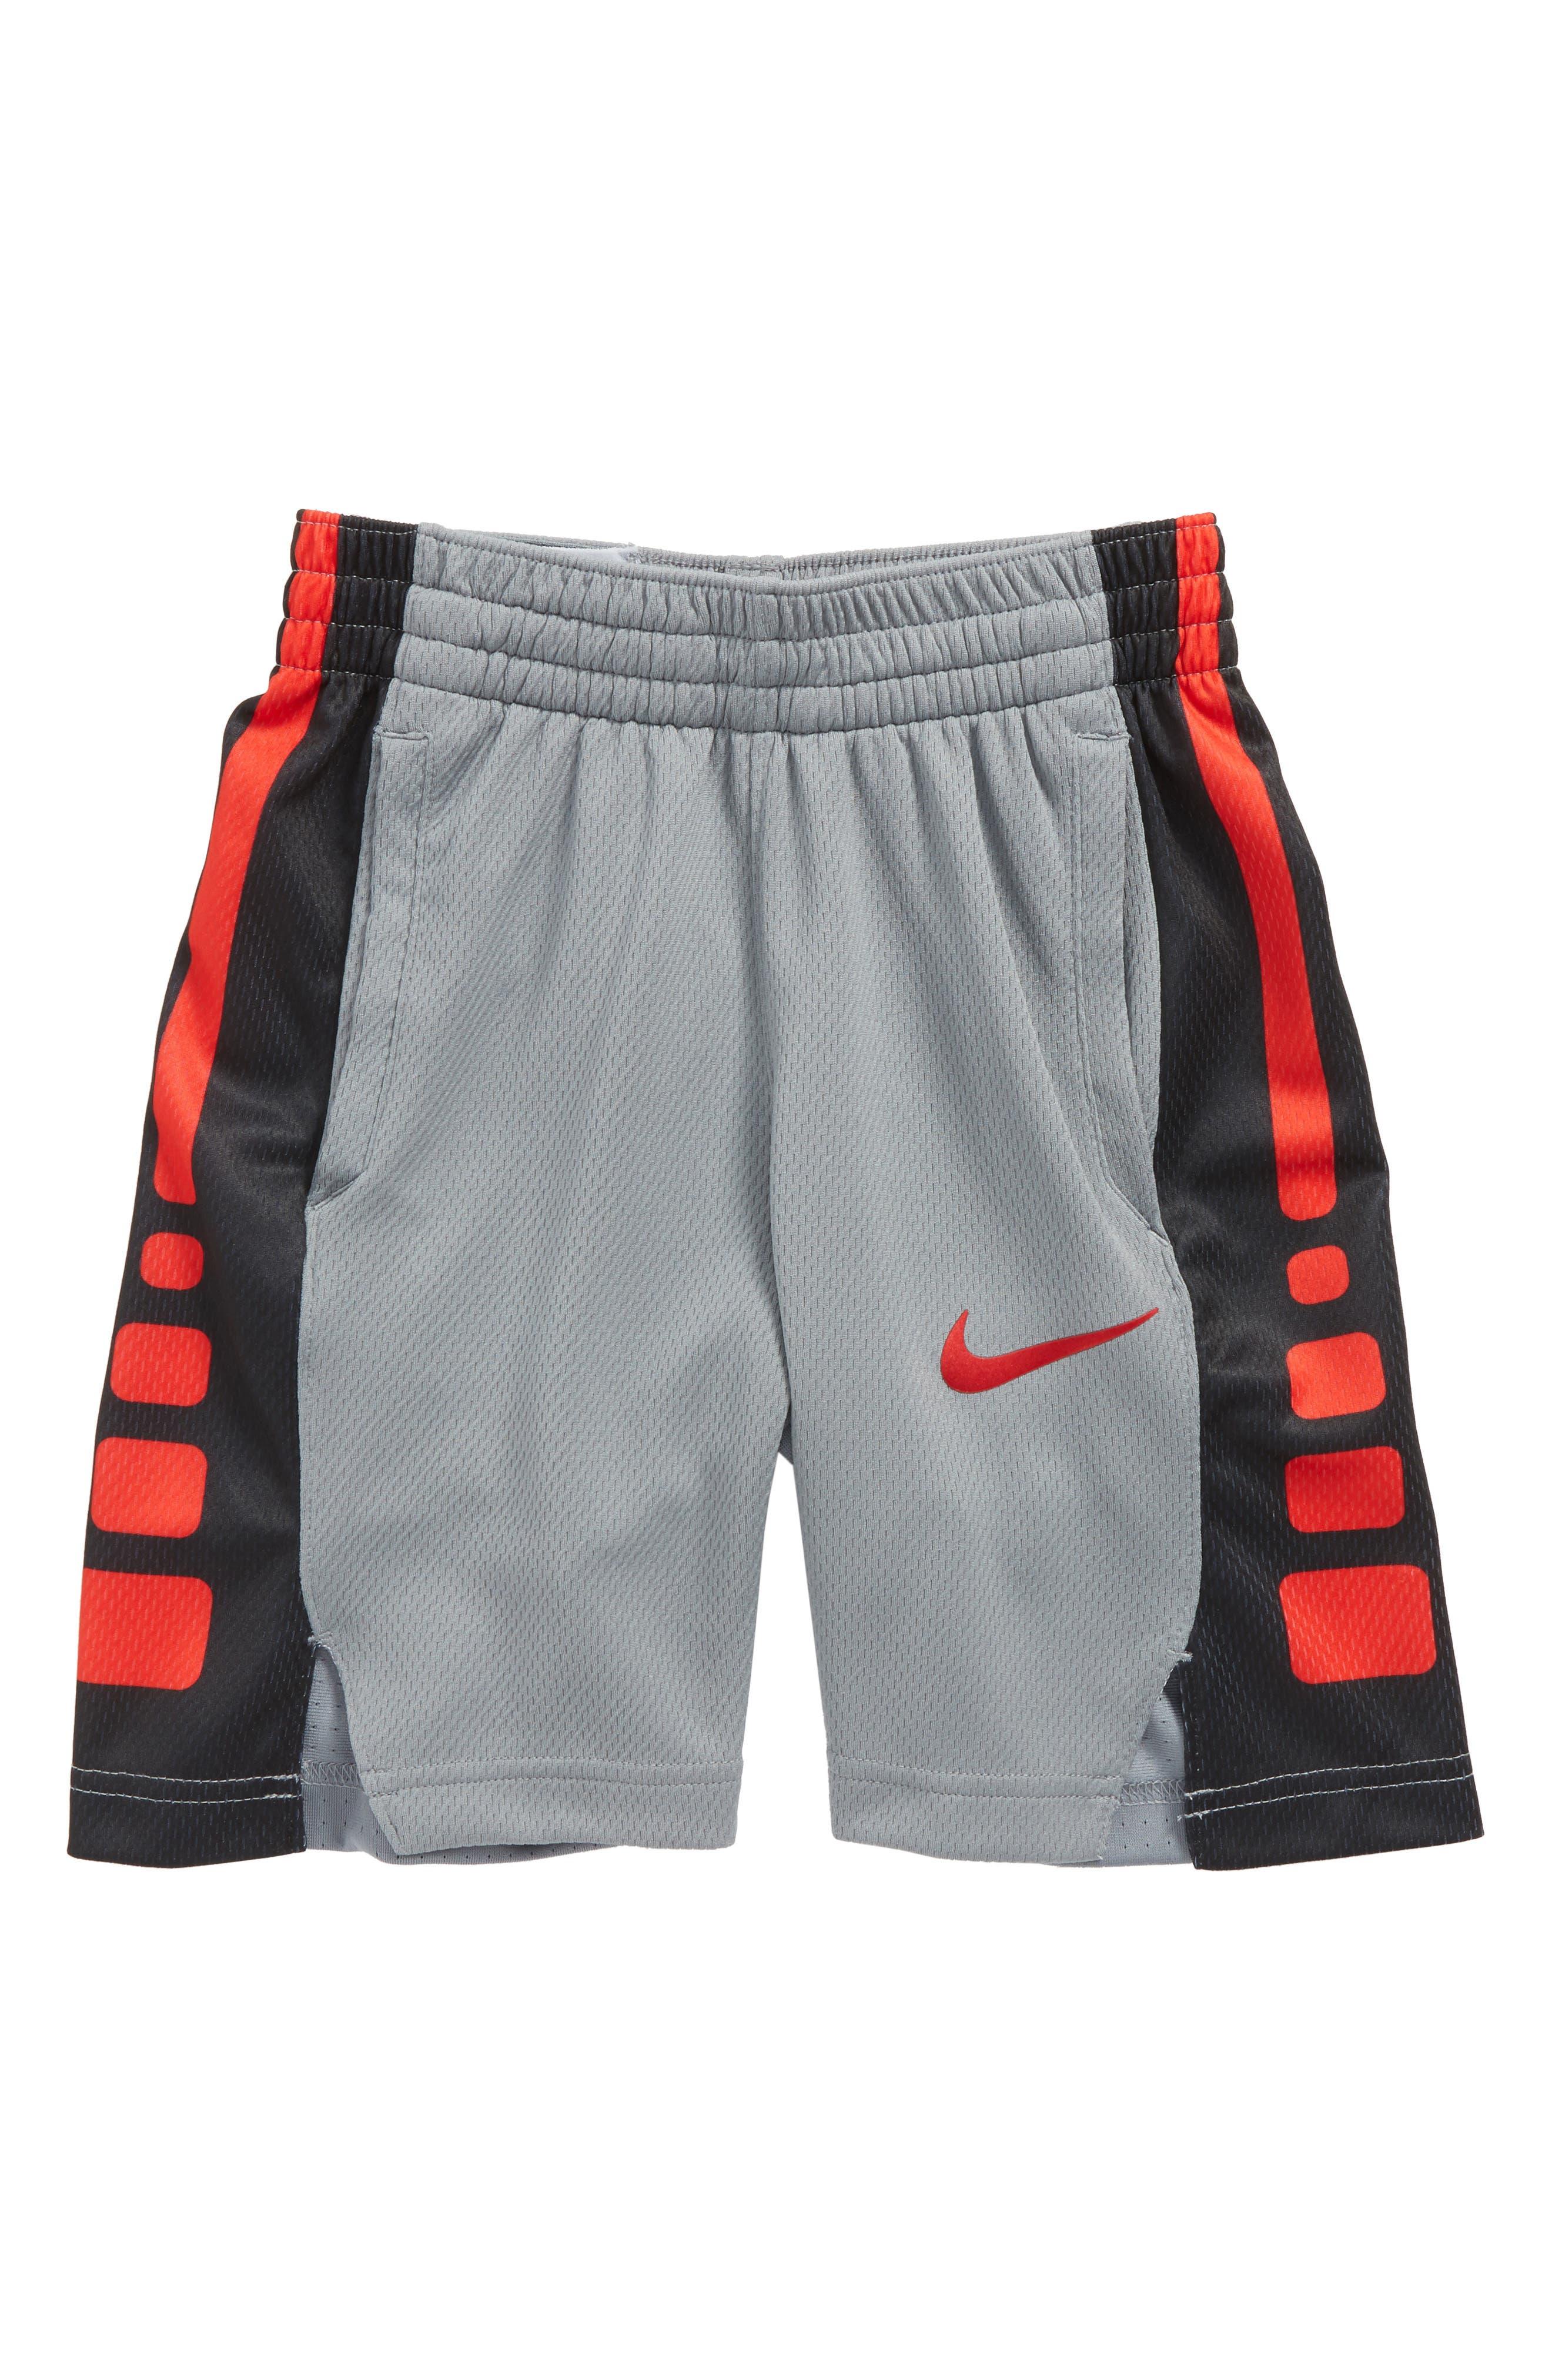 Dry Elite Basketball Shorts,                         Main,                         color, Grey 2